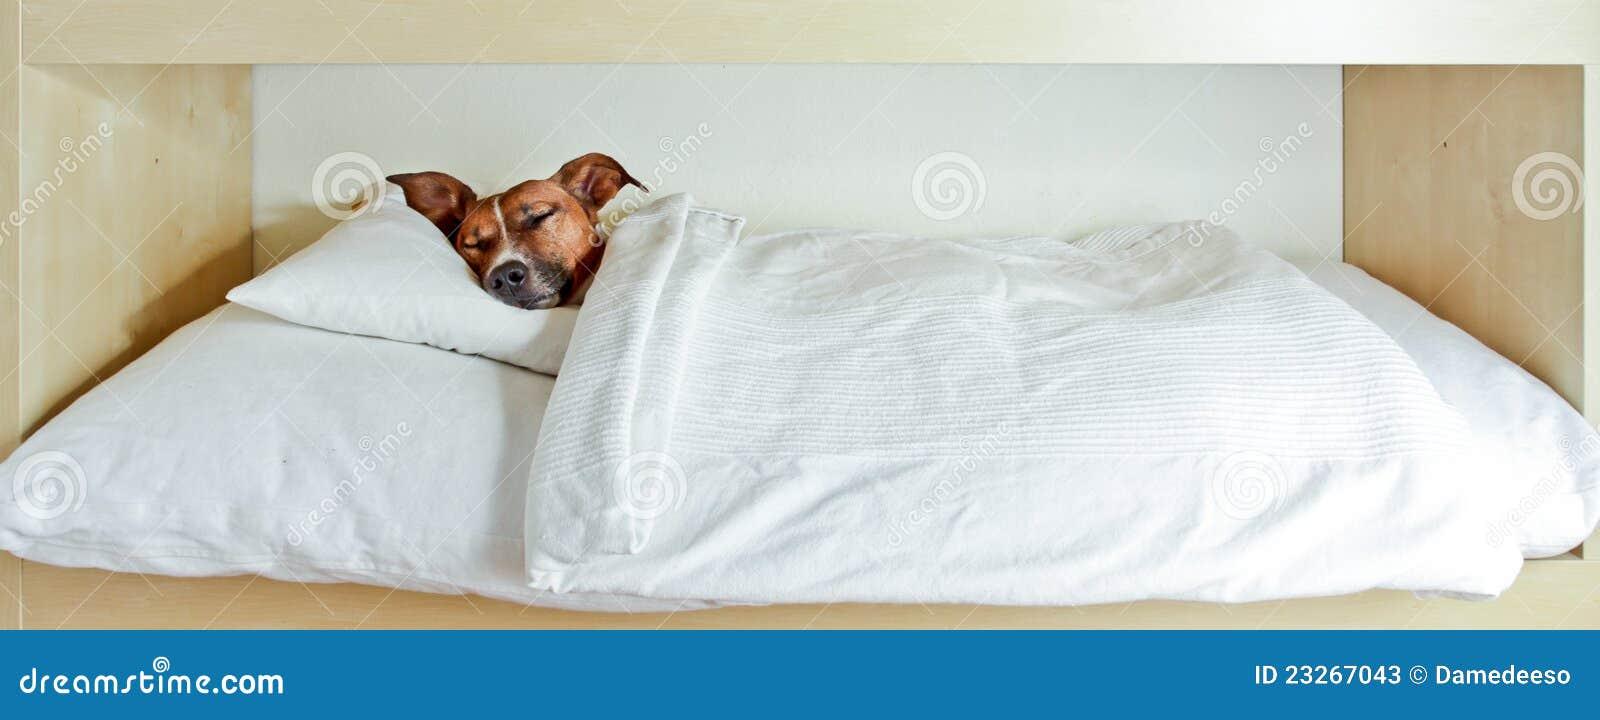 Persiga dormido